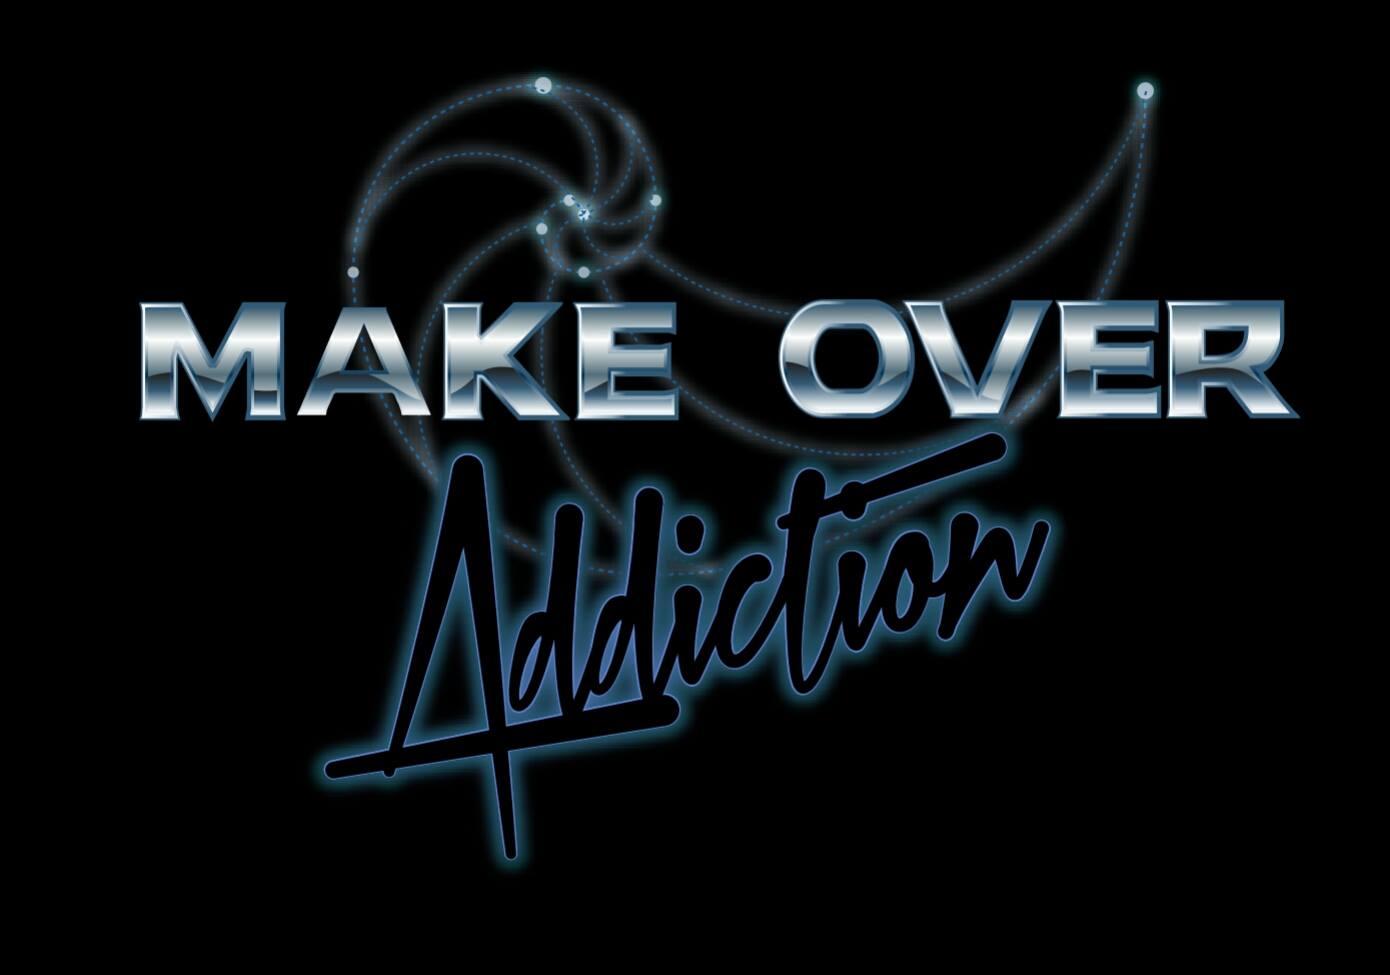 MAKE-OVER ADDICTION